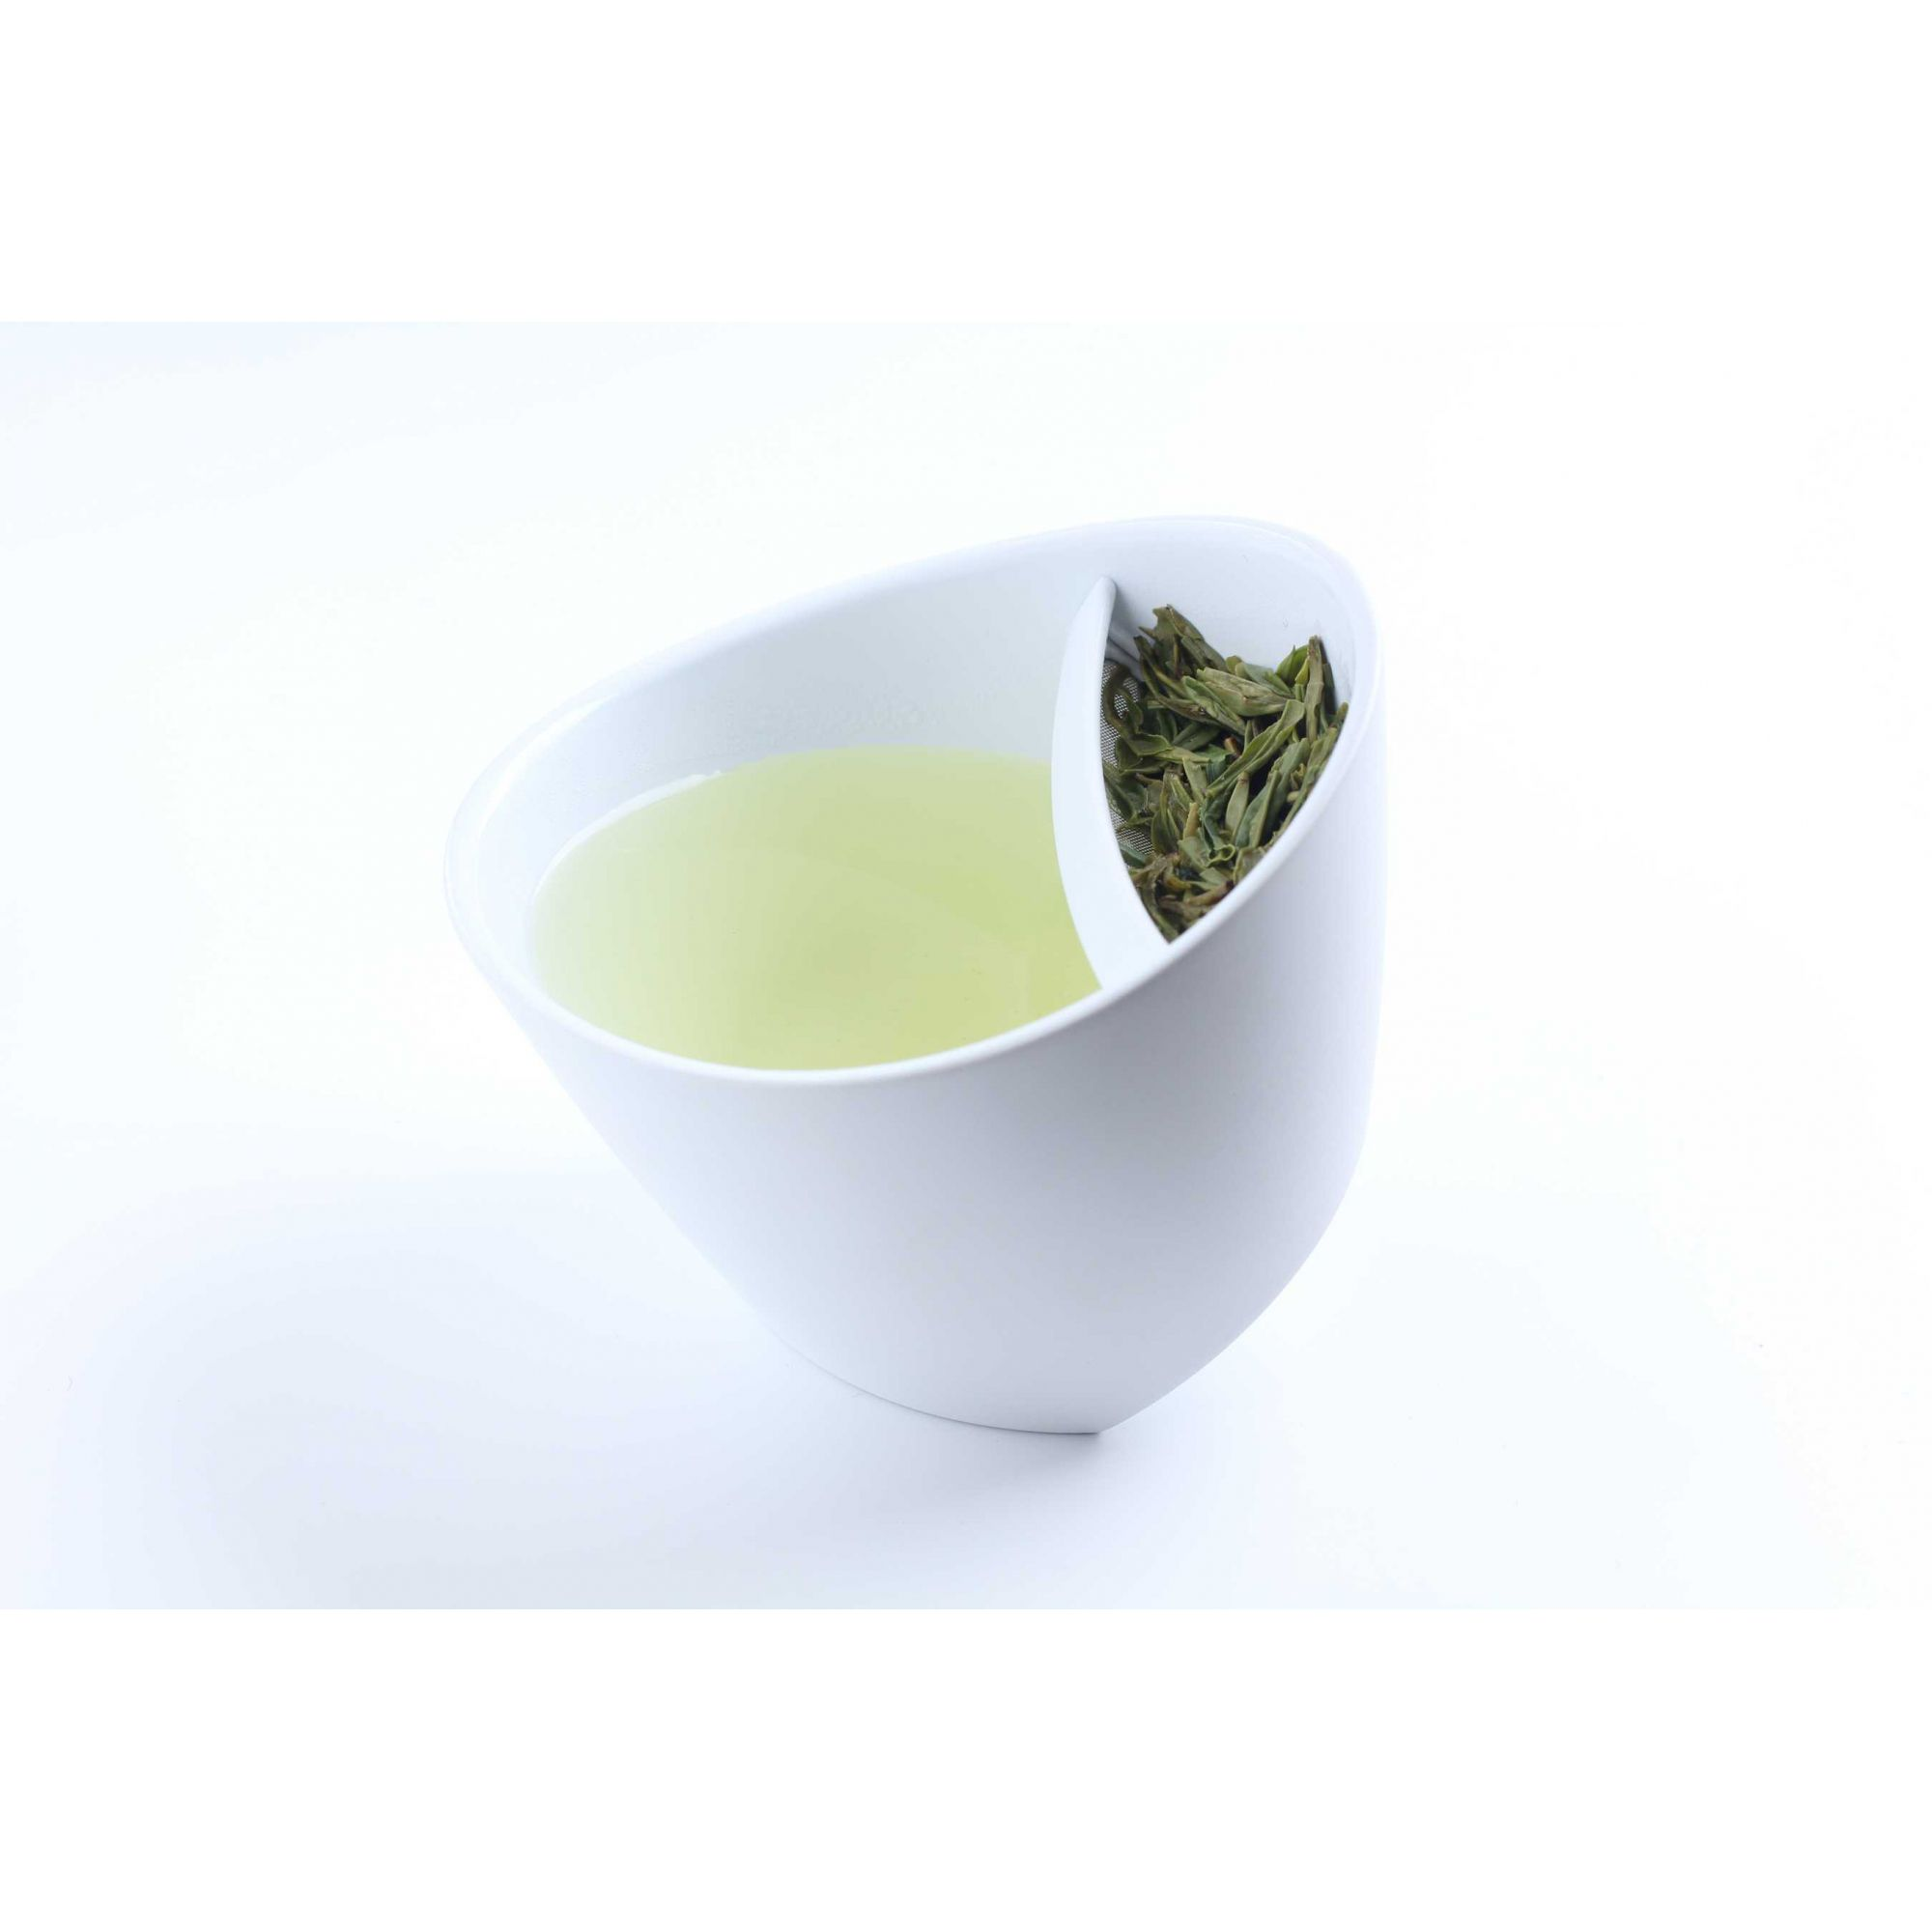 Kit 5x Xícara de chá Magisso branca